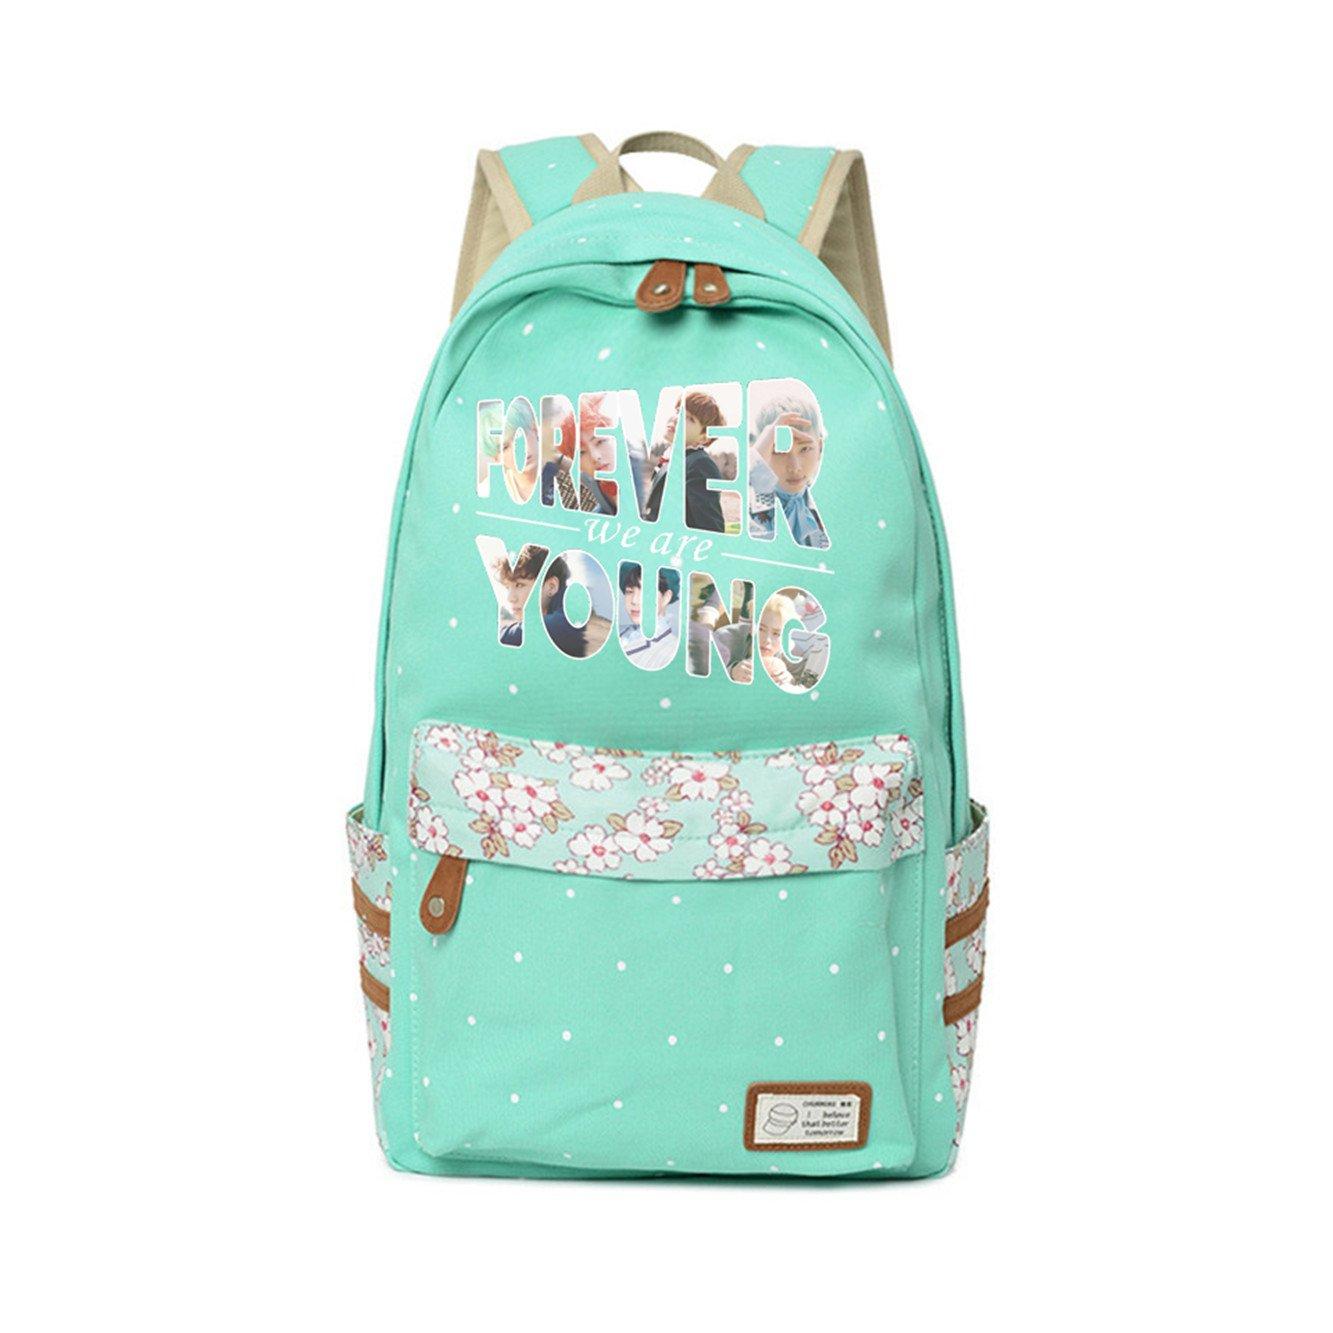 JUSTGOGO KPOP BTS Bangtan boys Backpack Daypack Laptop Bag College Bag Book Bag School Bag (Green 2)